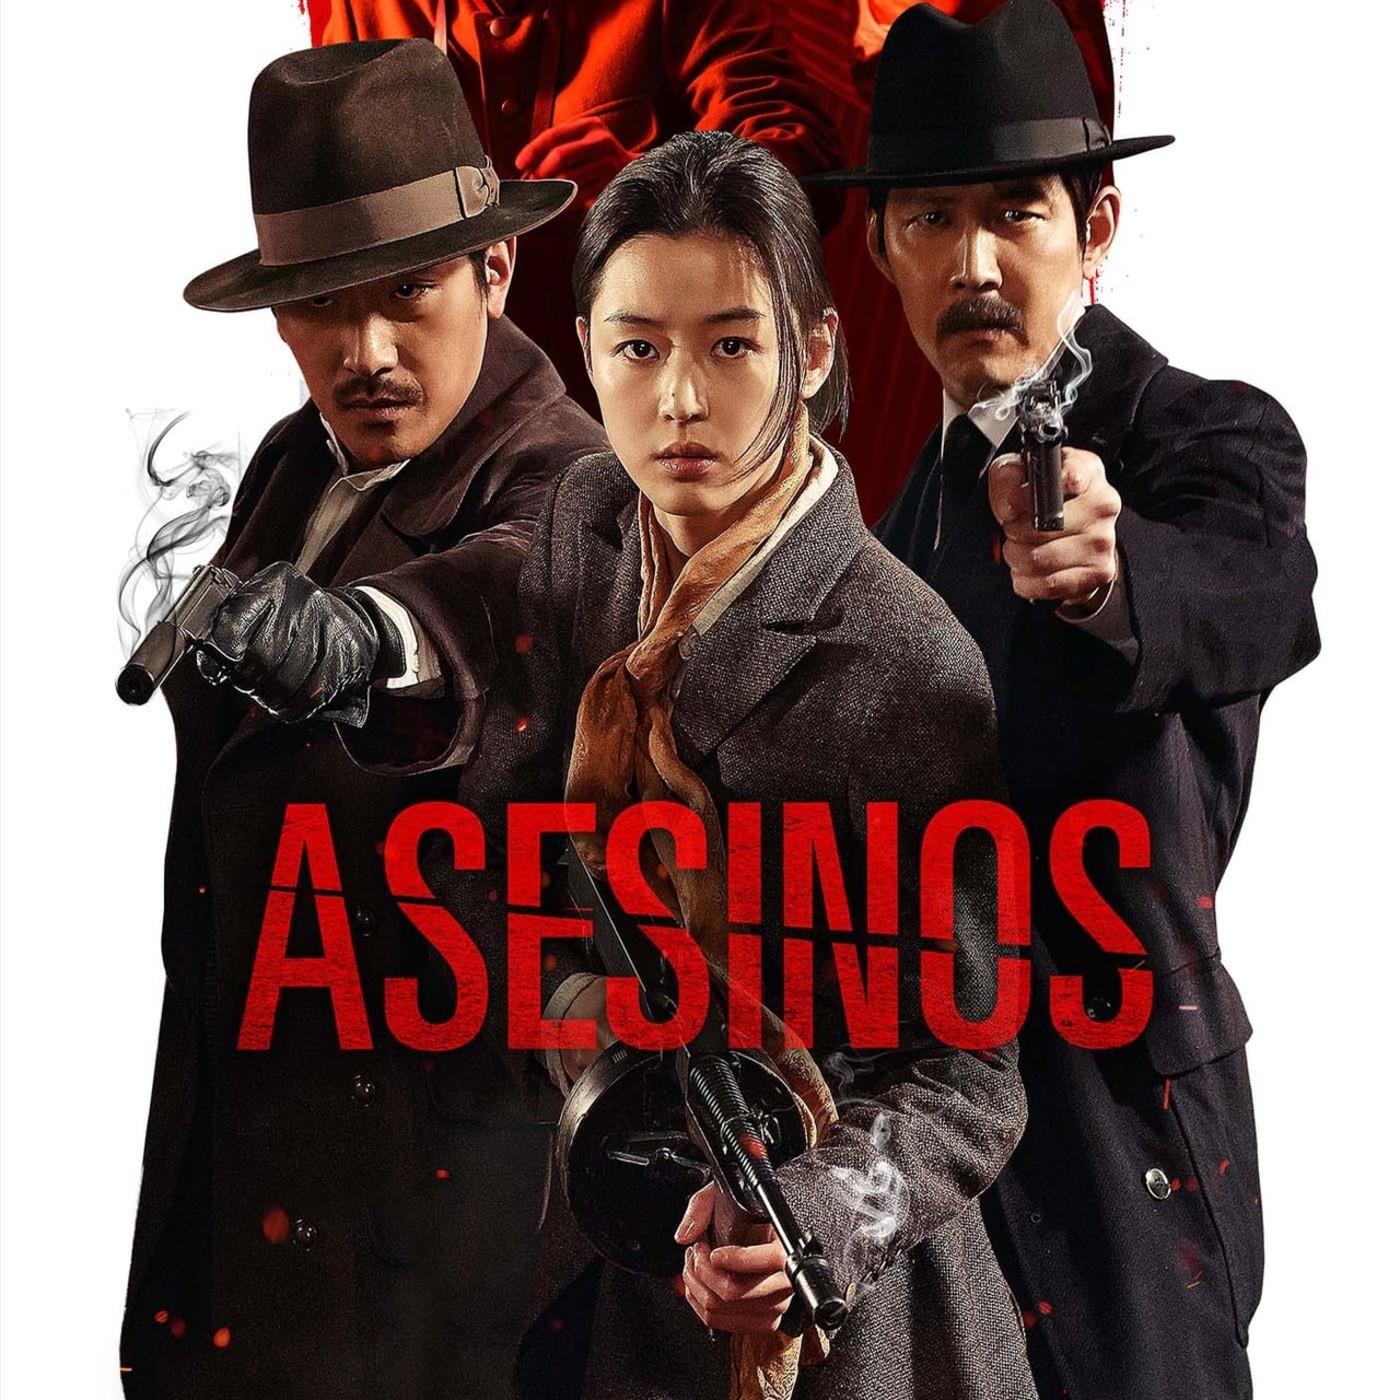 Asesinos (2015) #Thriller #Drama #peliculas #audesc #podcast